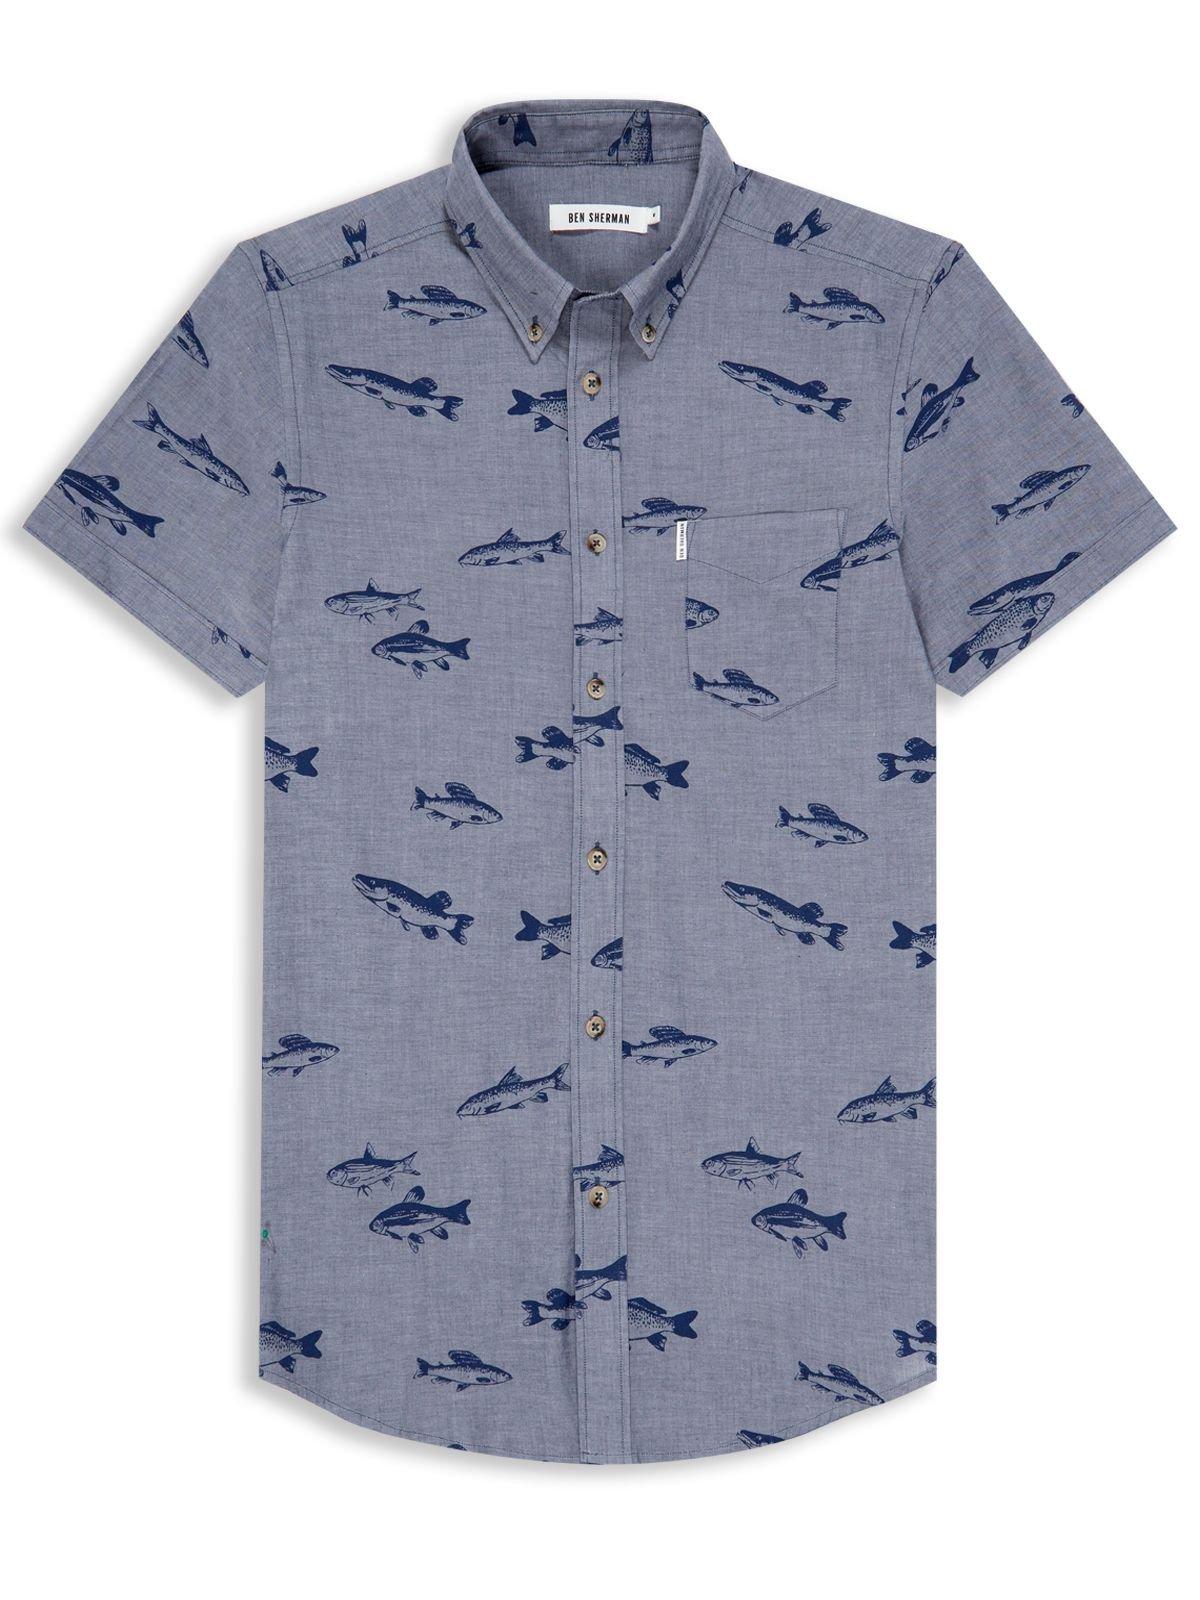 Ben sherman fish print shirt in blue for men lyst for Fish print shirt